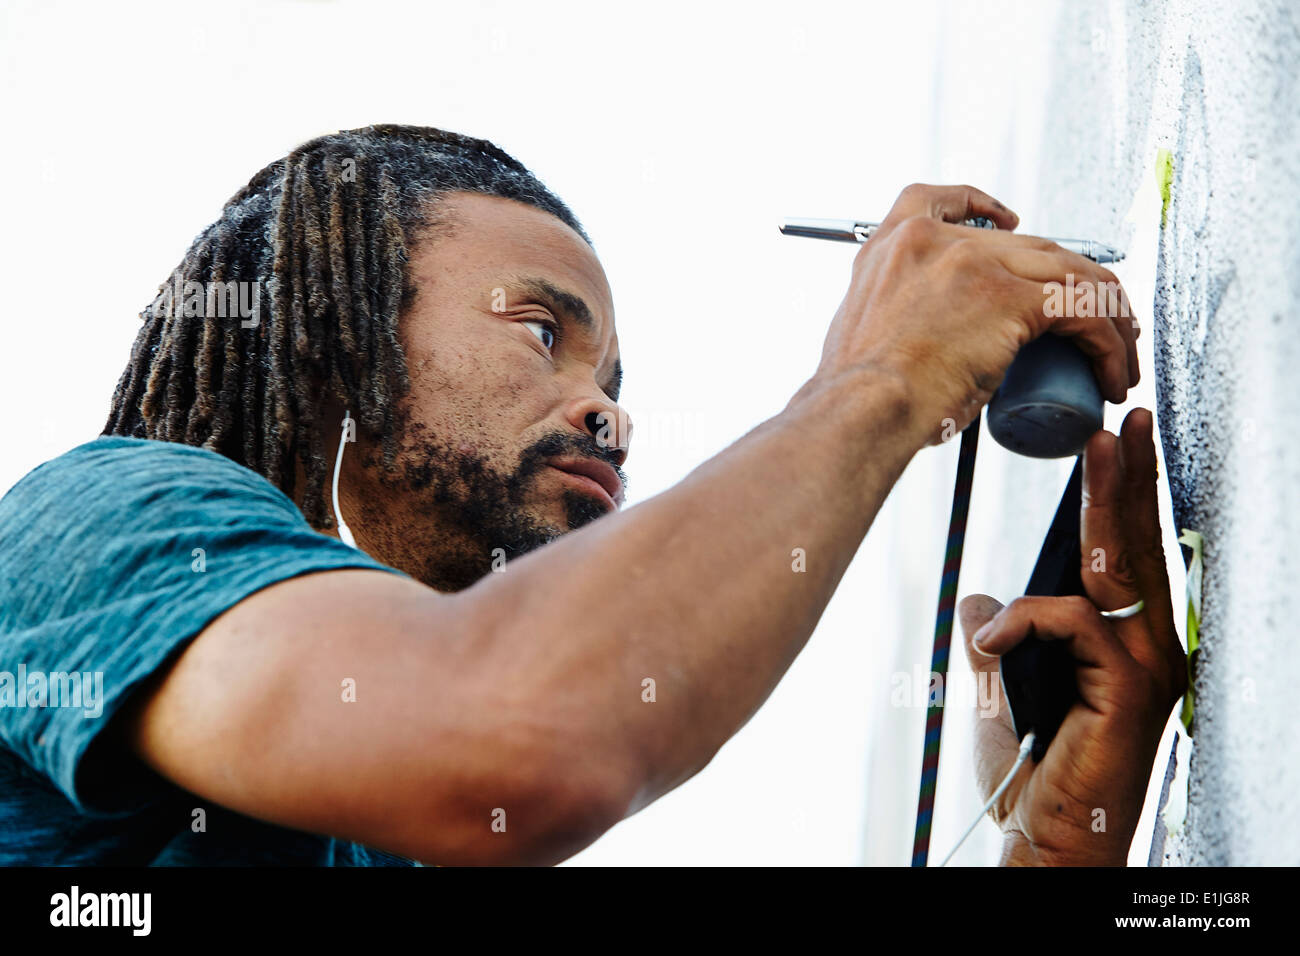 Nahaufnahme eines männlichen Afroamerikaner Airbrush Künstler Malerei Wandbild Stockbild